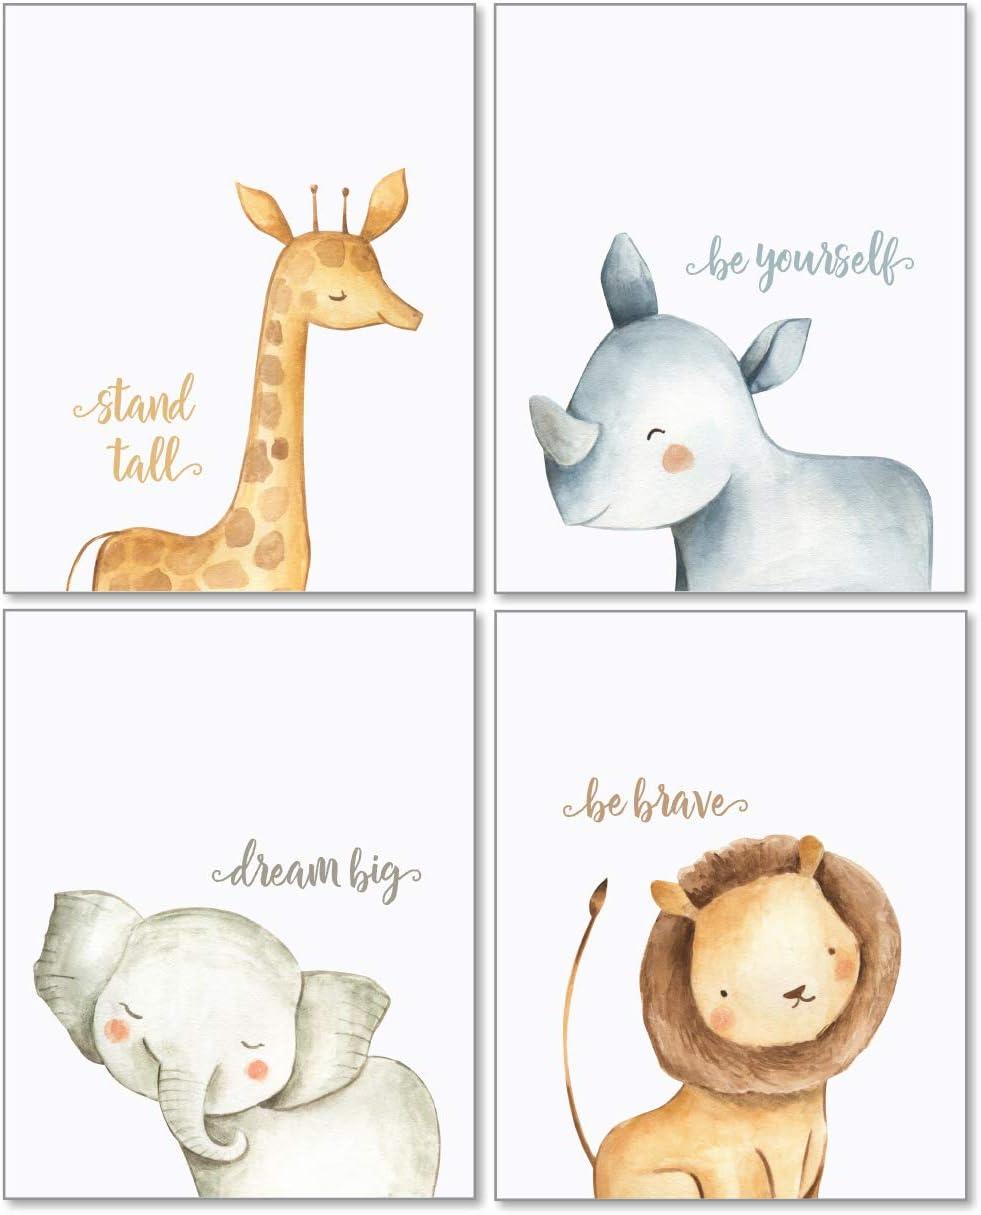 Amazon Com Confetti Fox Safari Baby Animals Nursery Wall Art Decor 8x10 Unframed Set Of 4 Prints Boy Girl Kids Watercolor Quotes Bedroom Bathroom Decorations Giraffe Rhino Elephant Lion Posters Prints